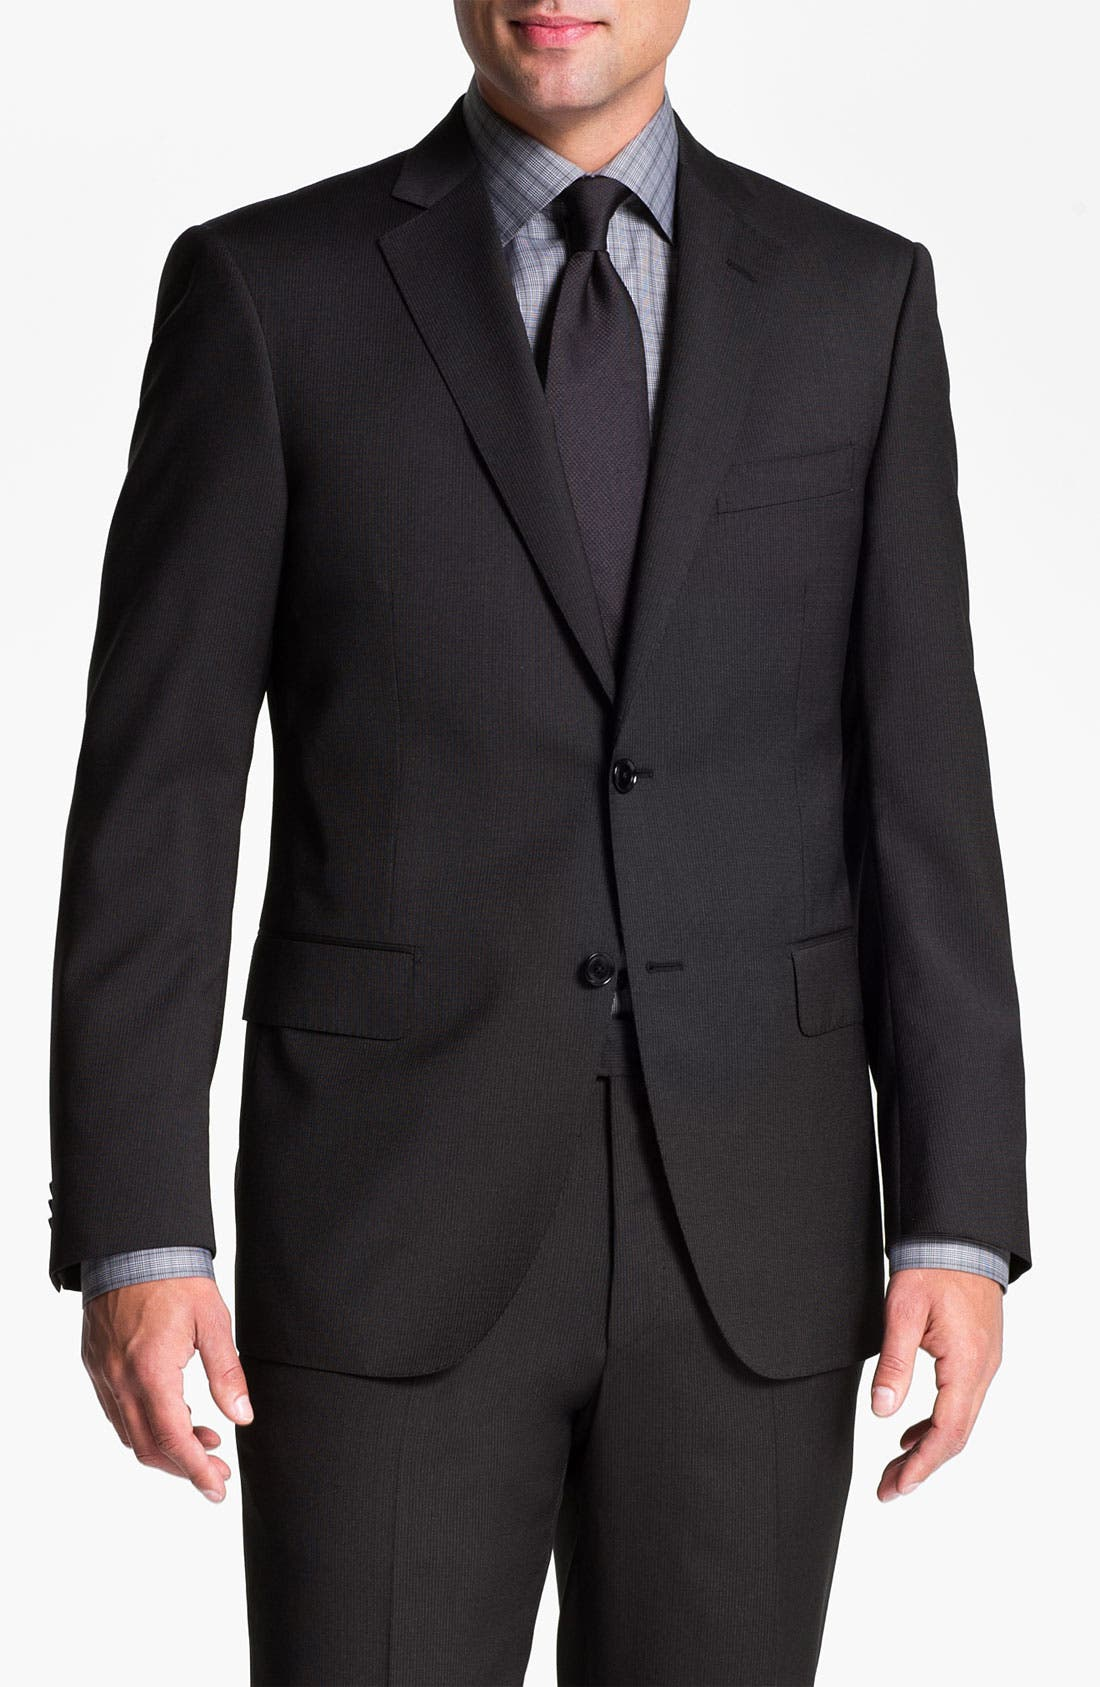 Alternate Image 1 Selected - Pal Zileri Trim Fit Wool Suit